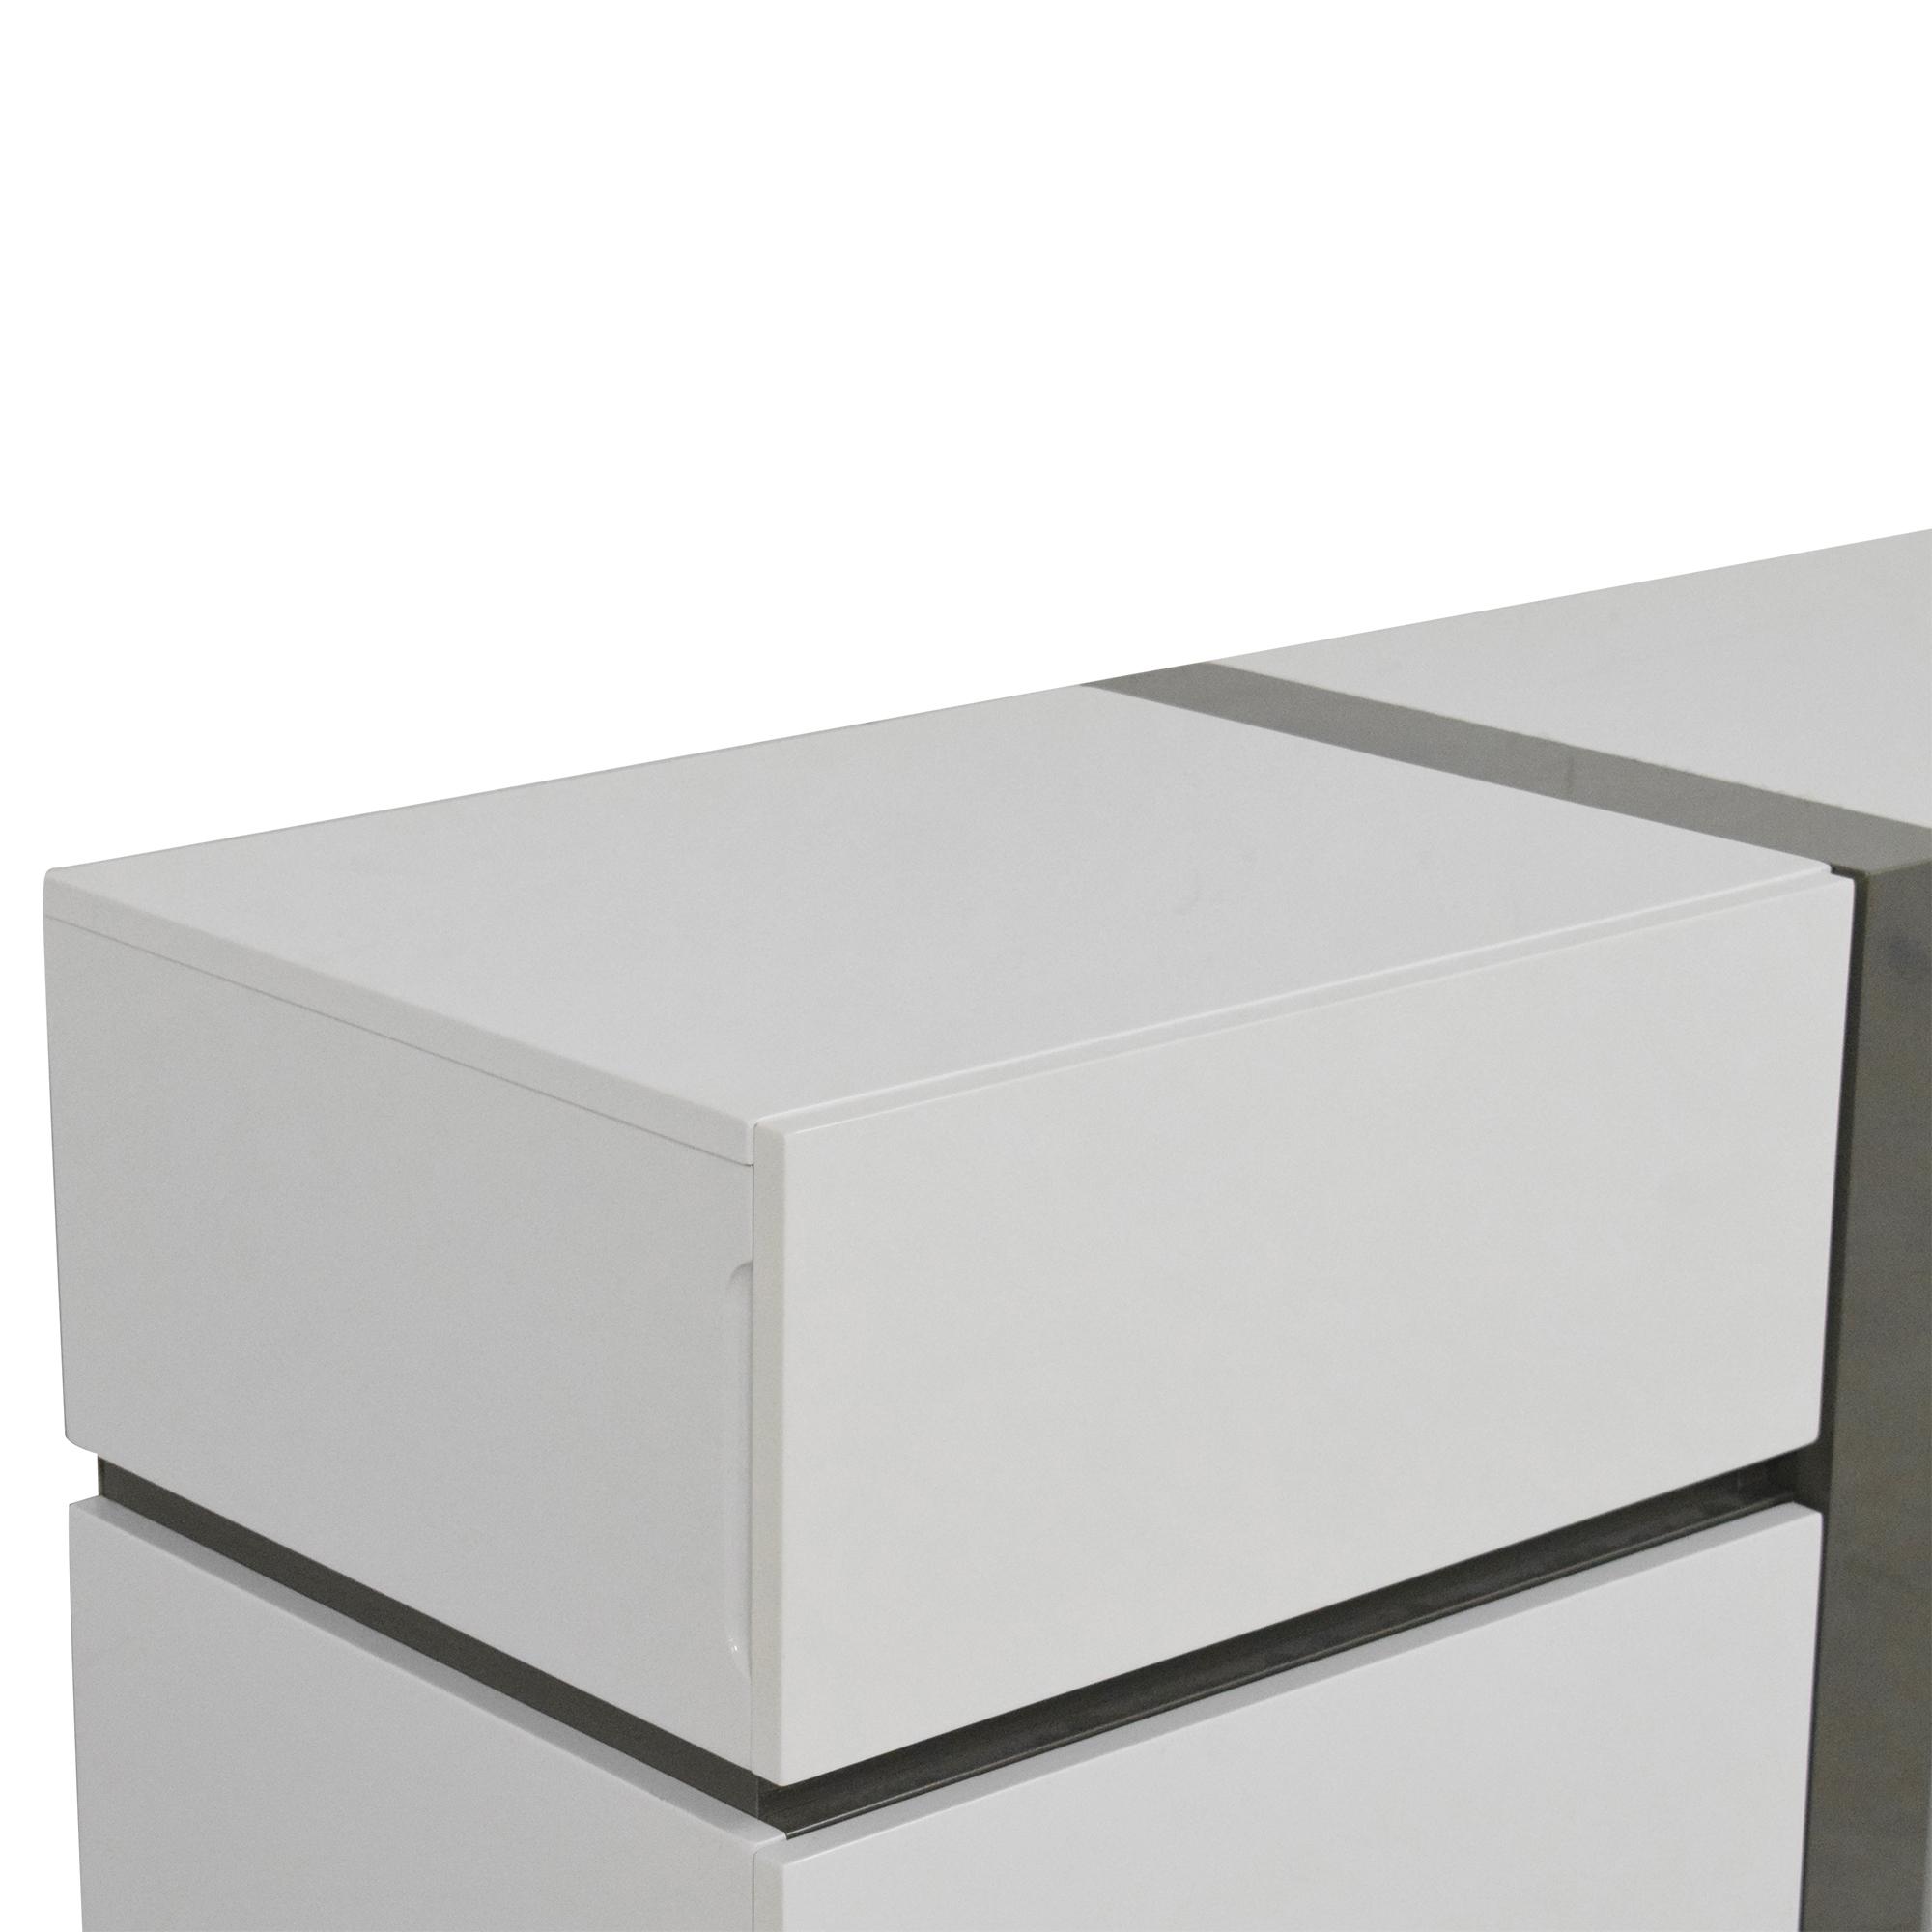 Chintaly Imports Chintaly Imports Manila Six Drawer Dresser on sale